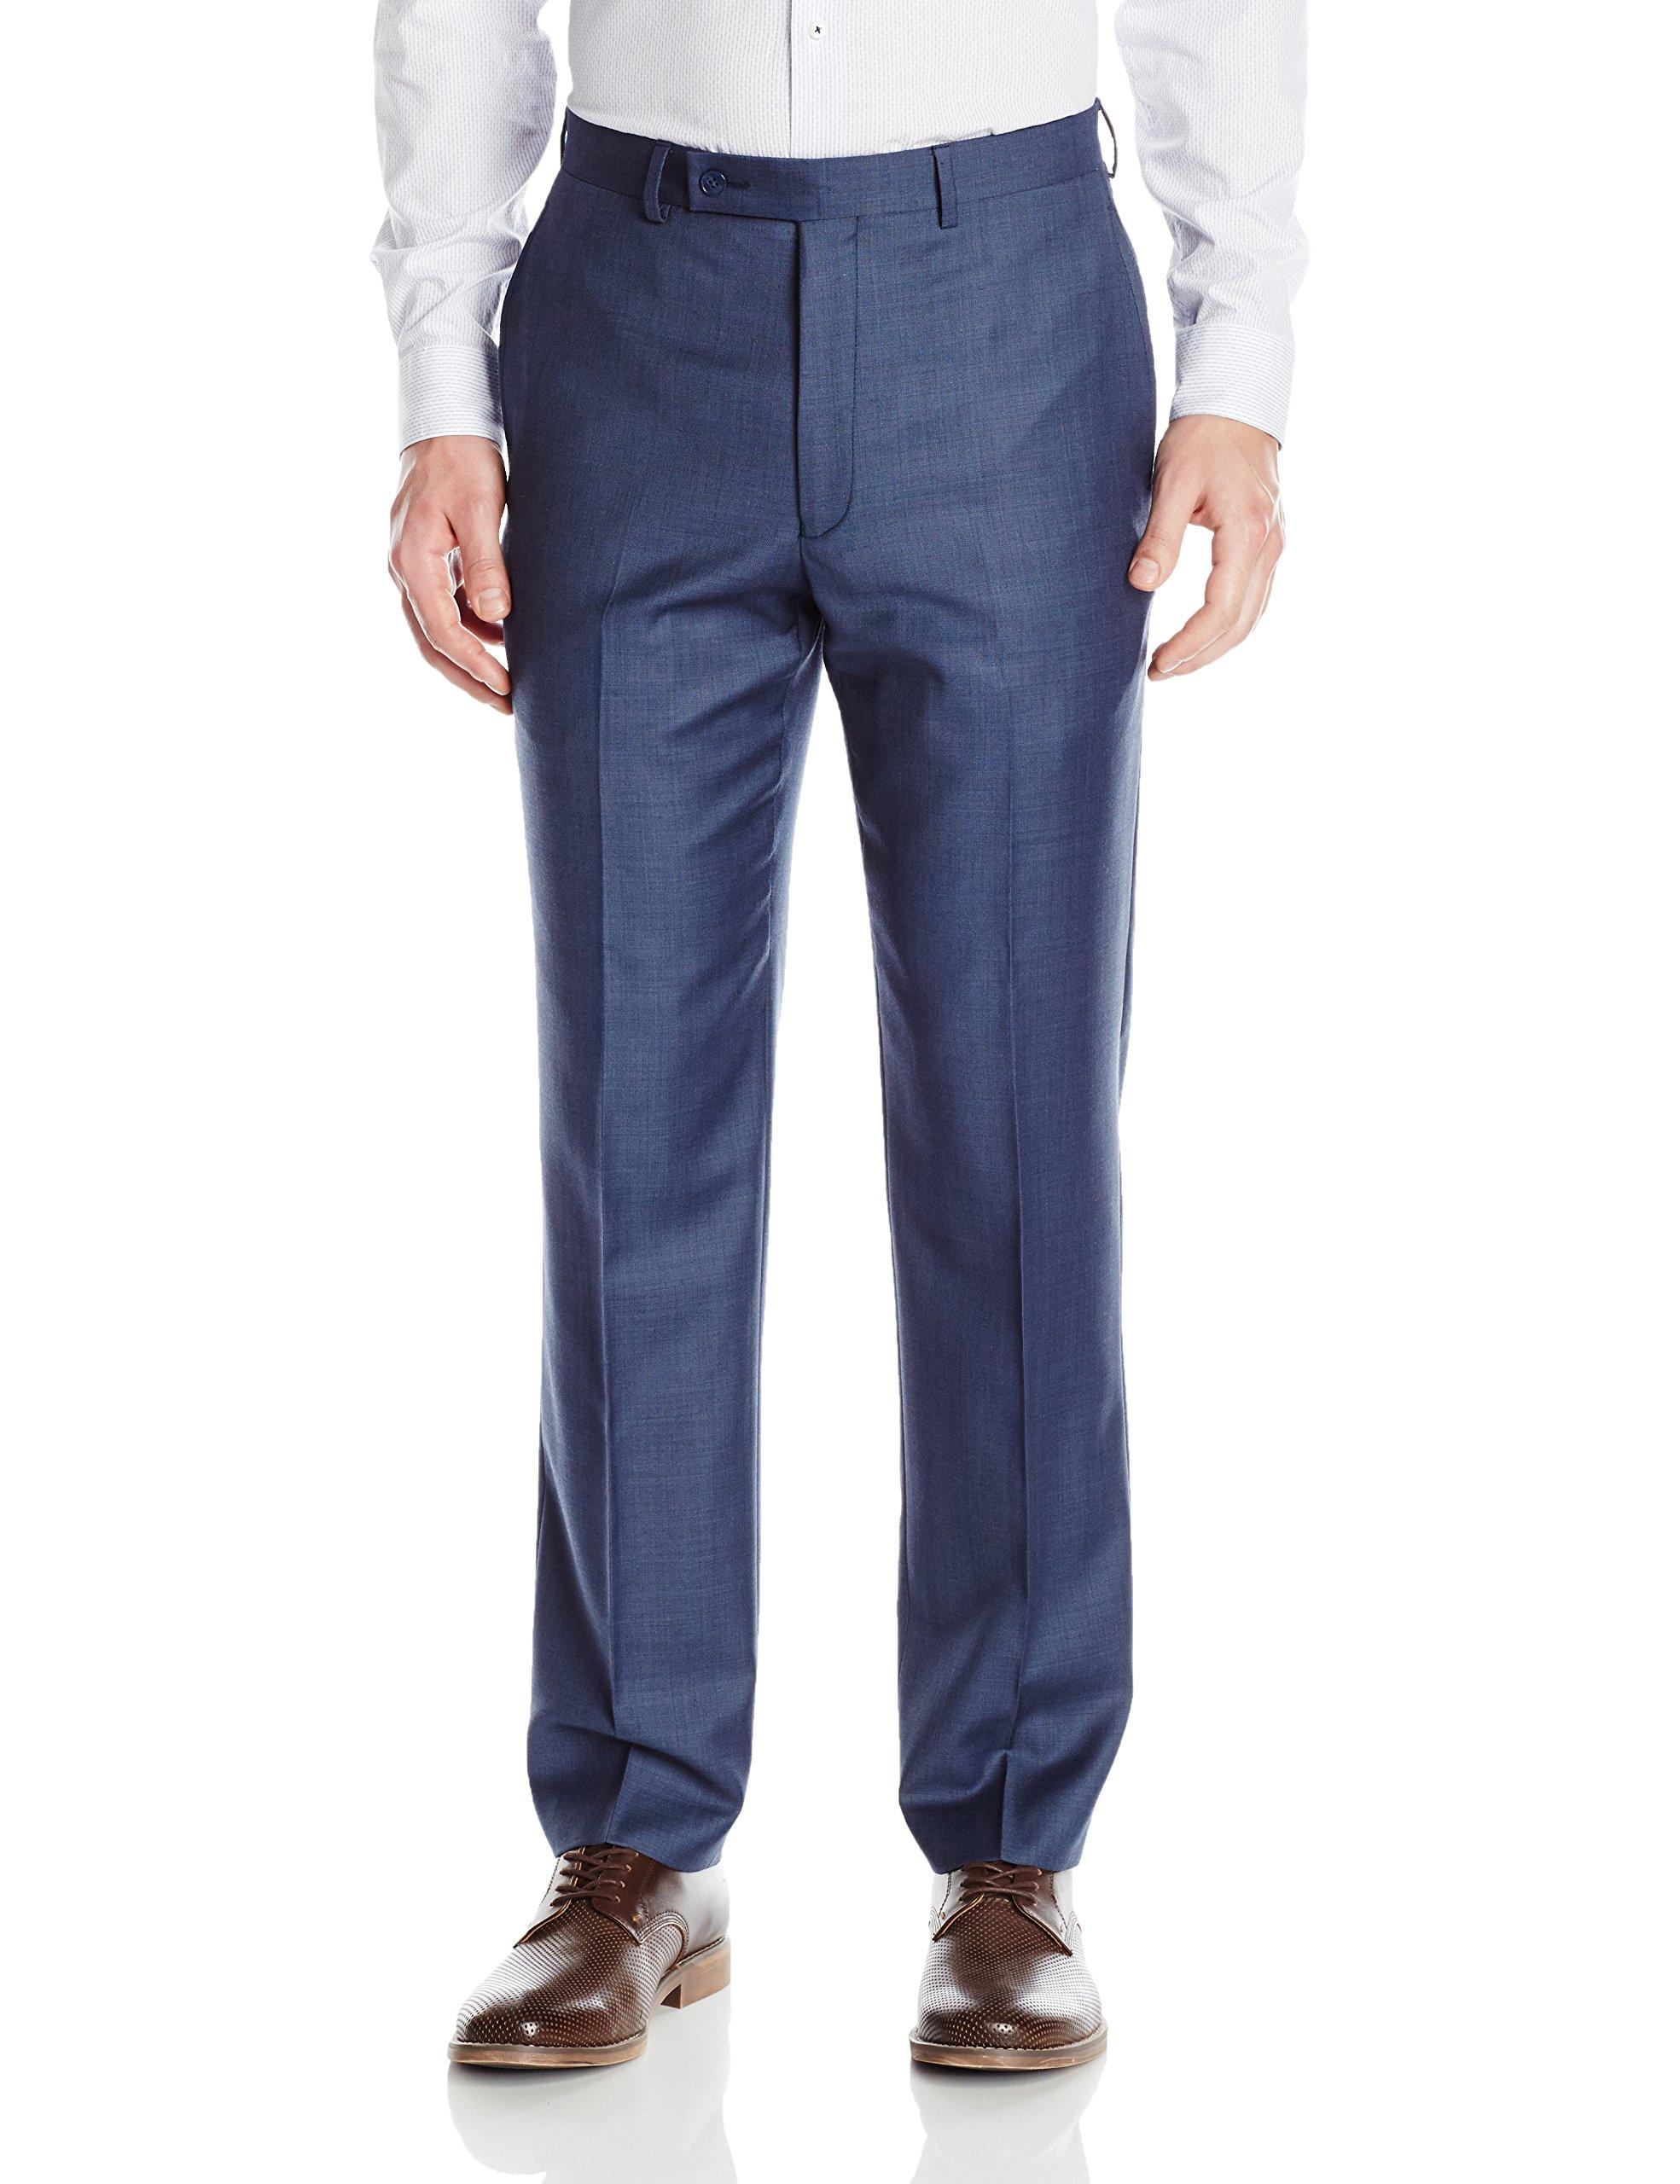 Calvin Klein Men's Modern Fit Suit Separate (Blazer and Pant), Blue Pant, 36 X 32